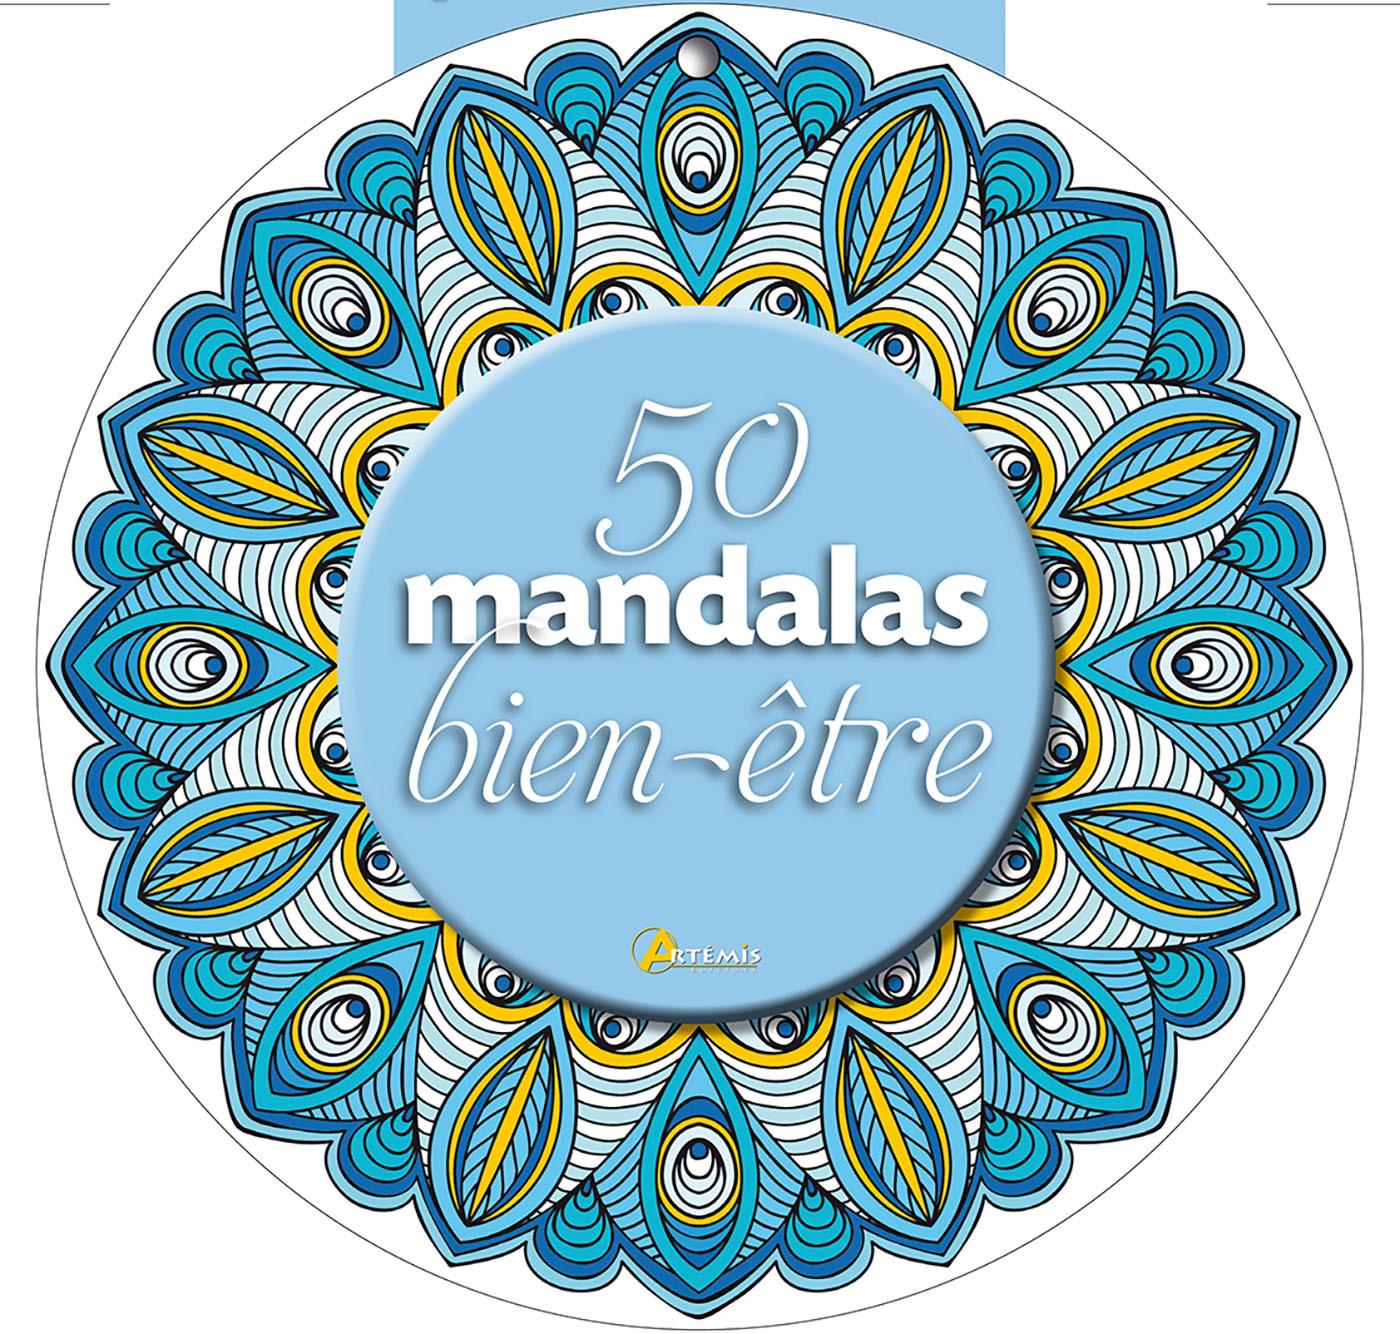 50 MANDALAS BIEN-ETRE